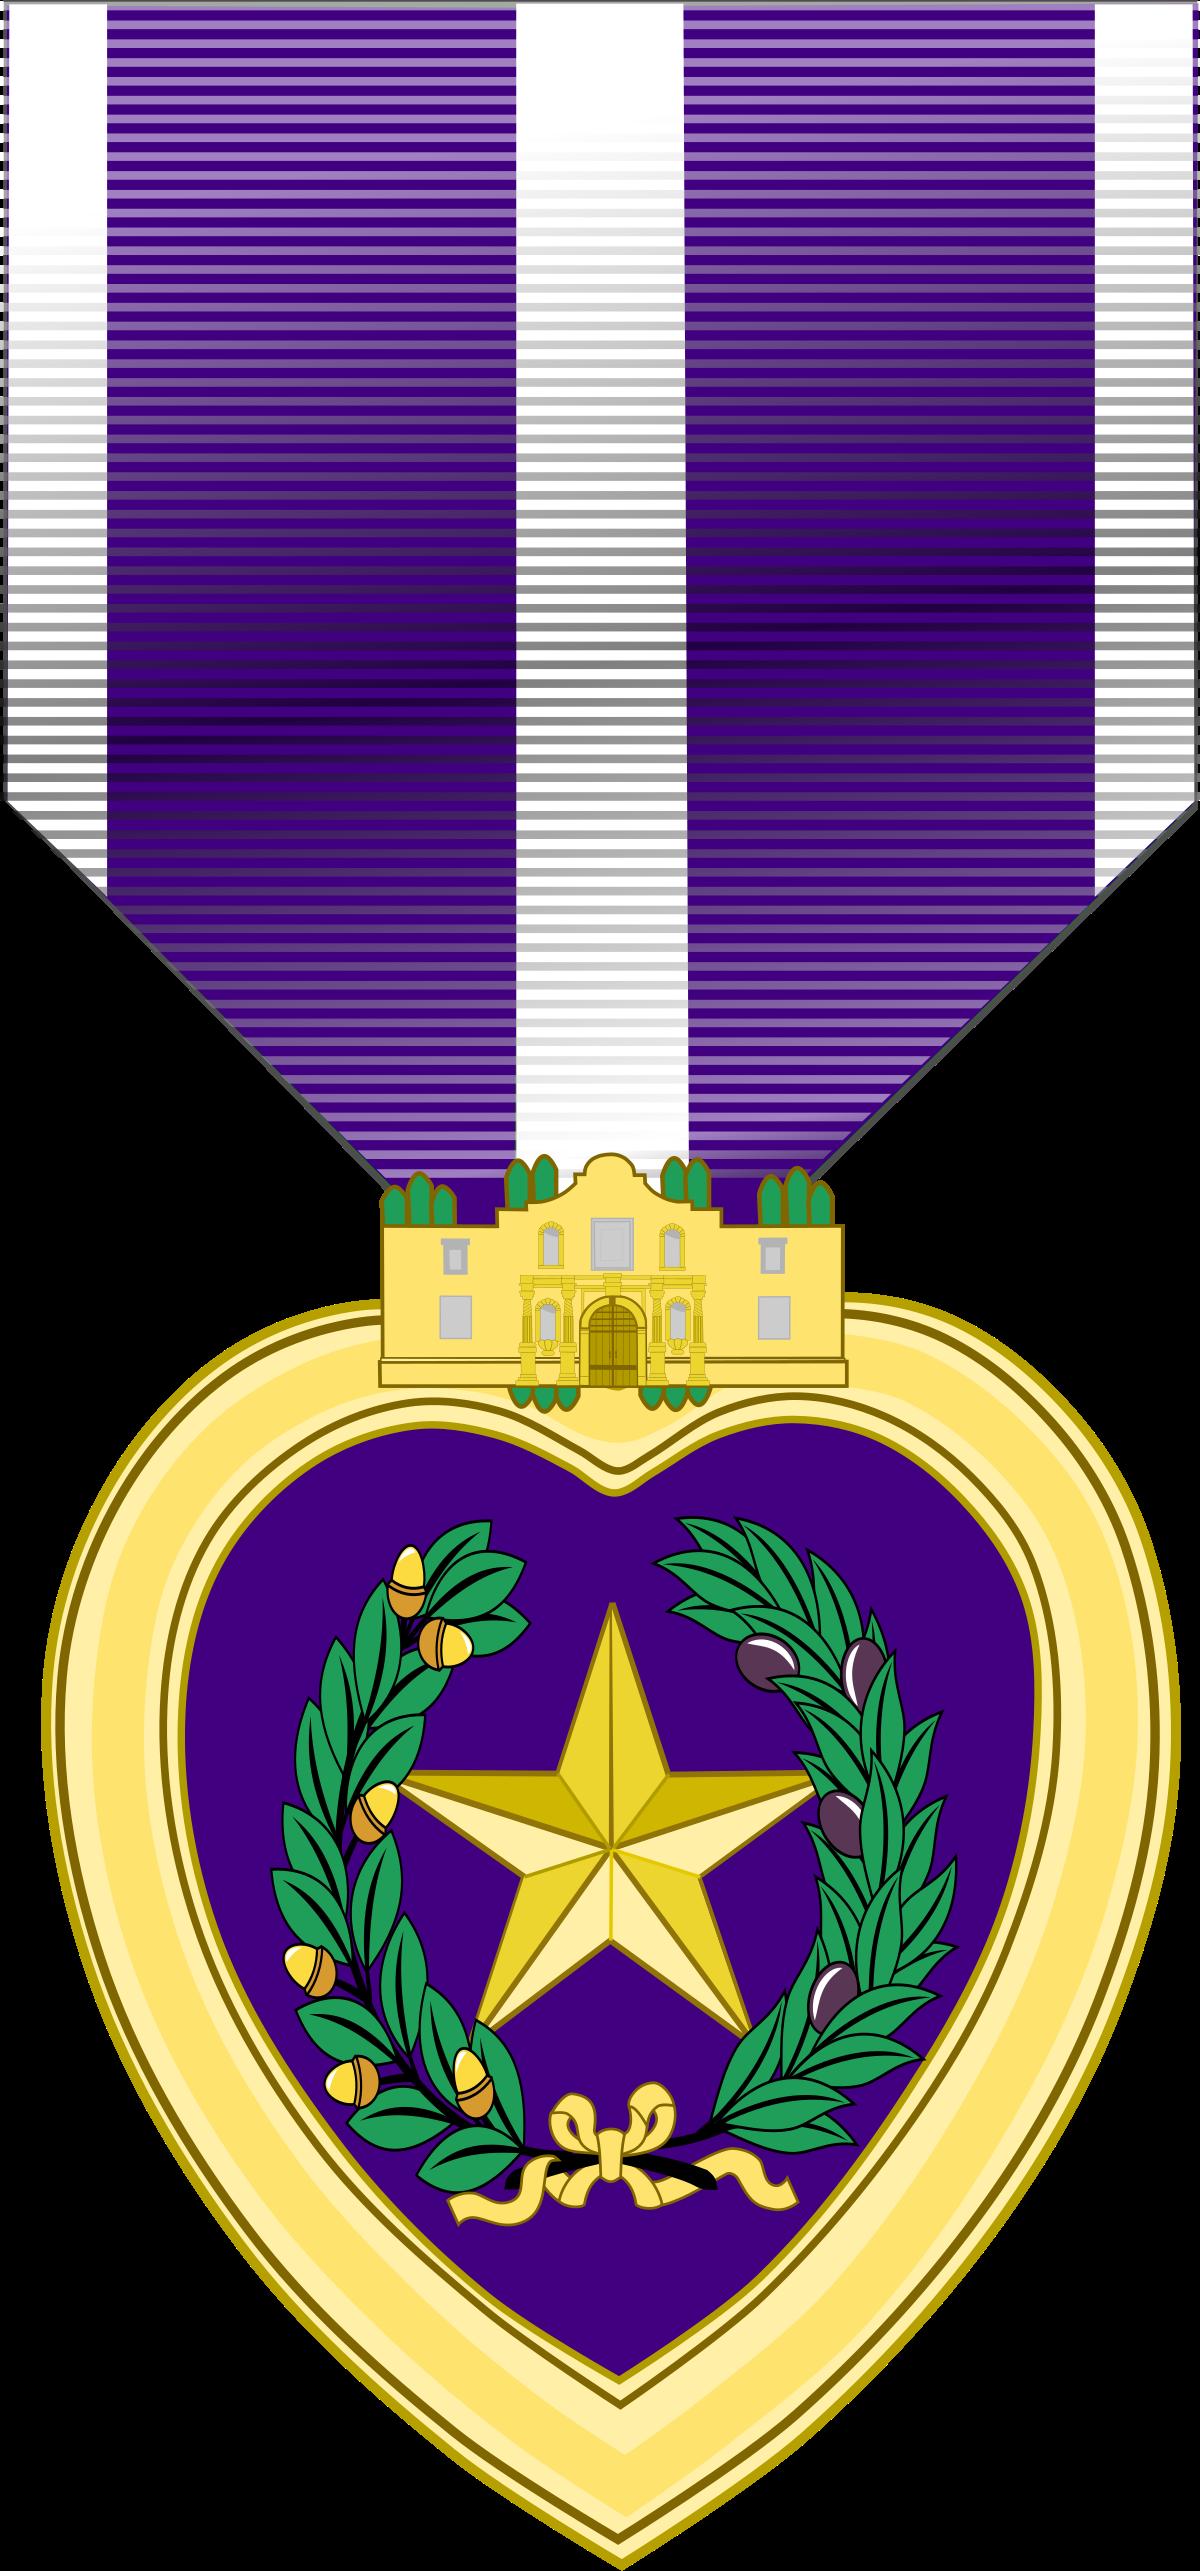 Purple clipart medal. Texas heart wikipedia